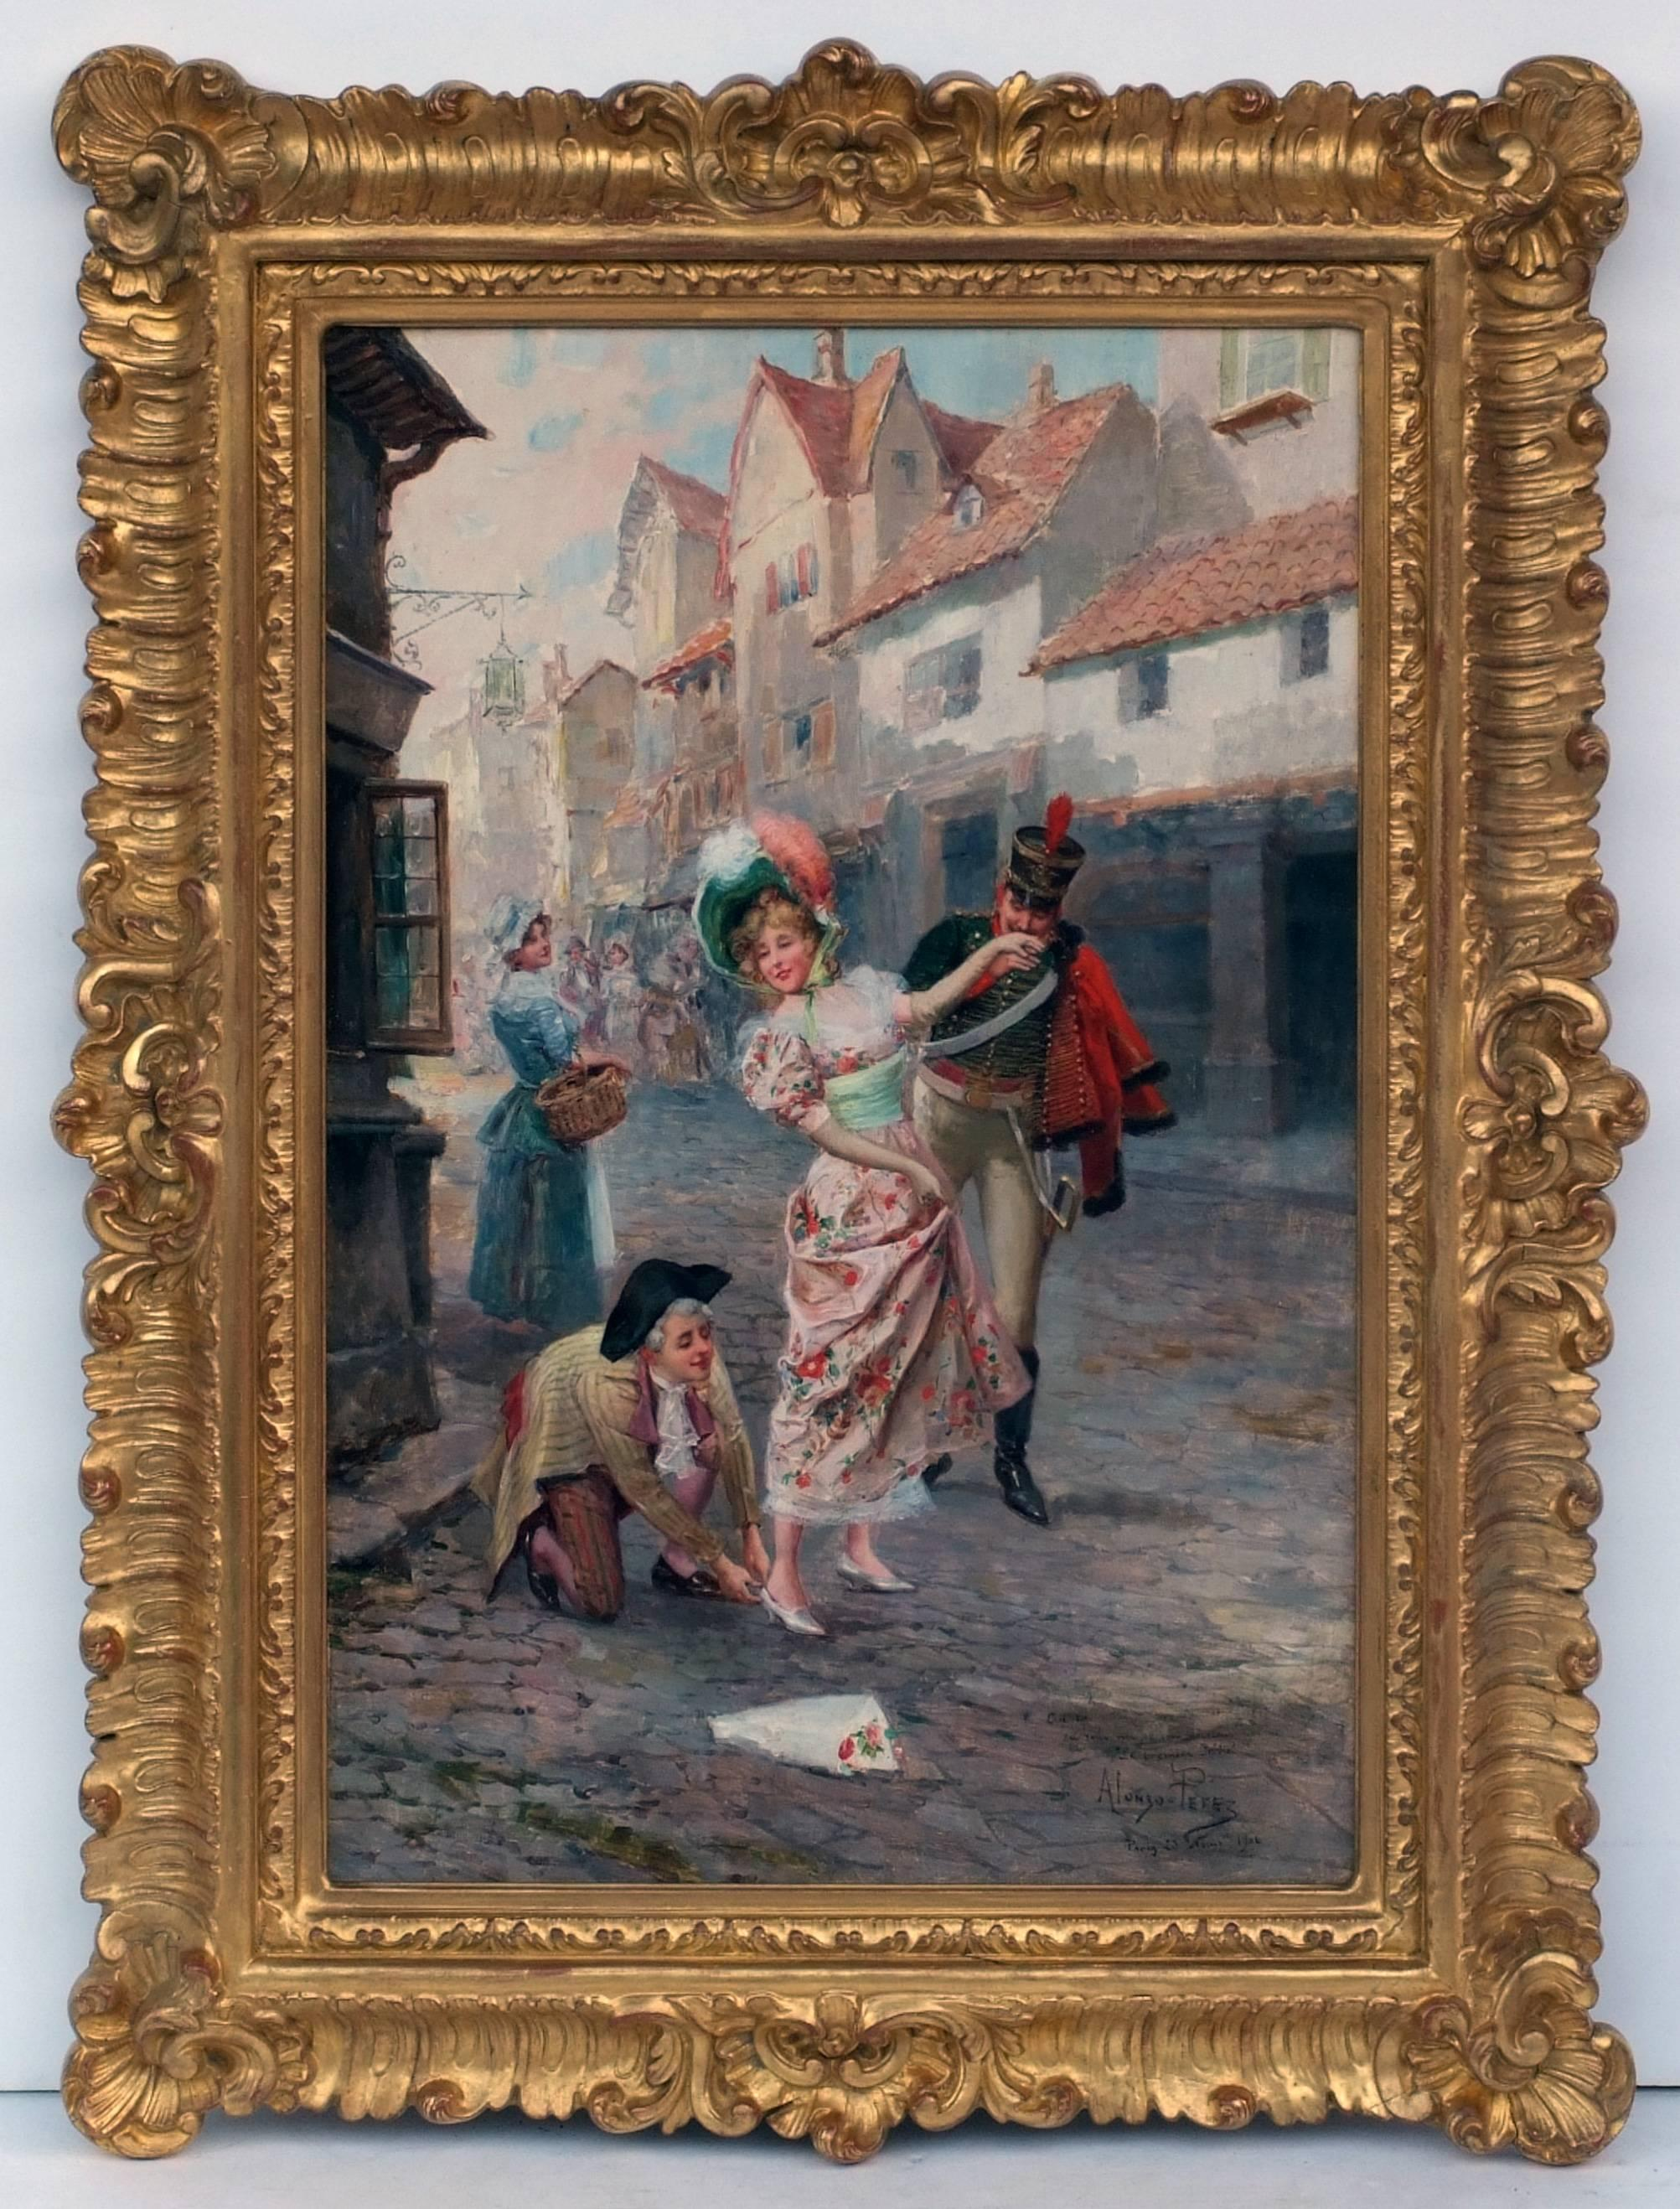 Alonso PEREZ - Painting Genre Scene in Paris